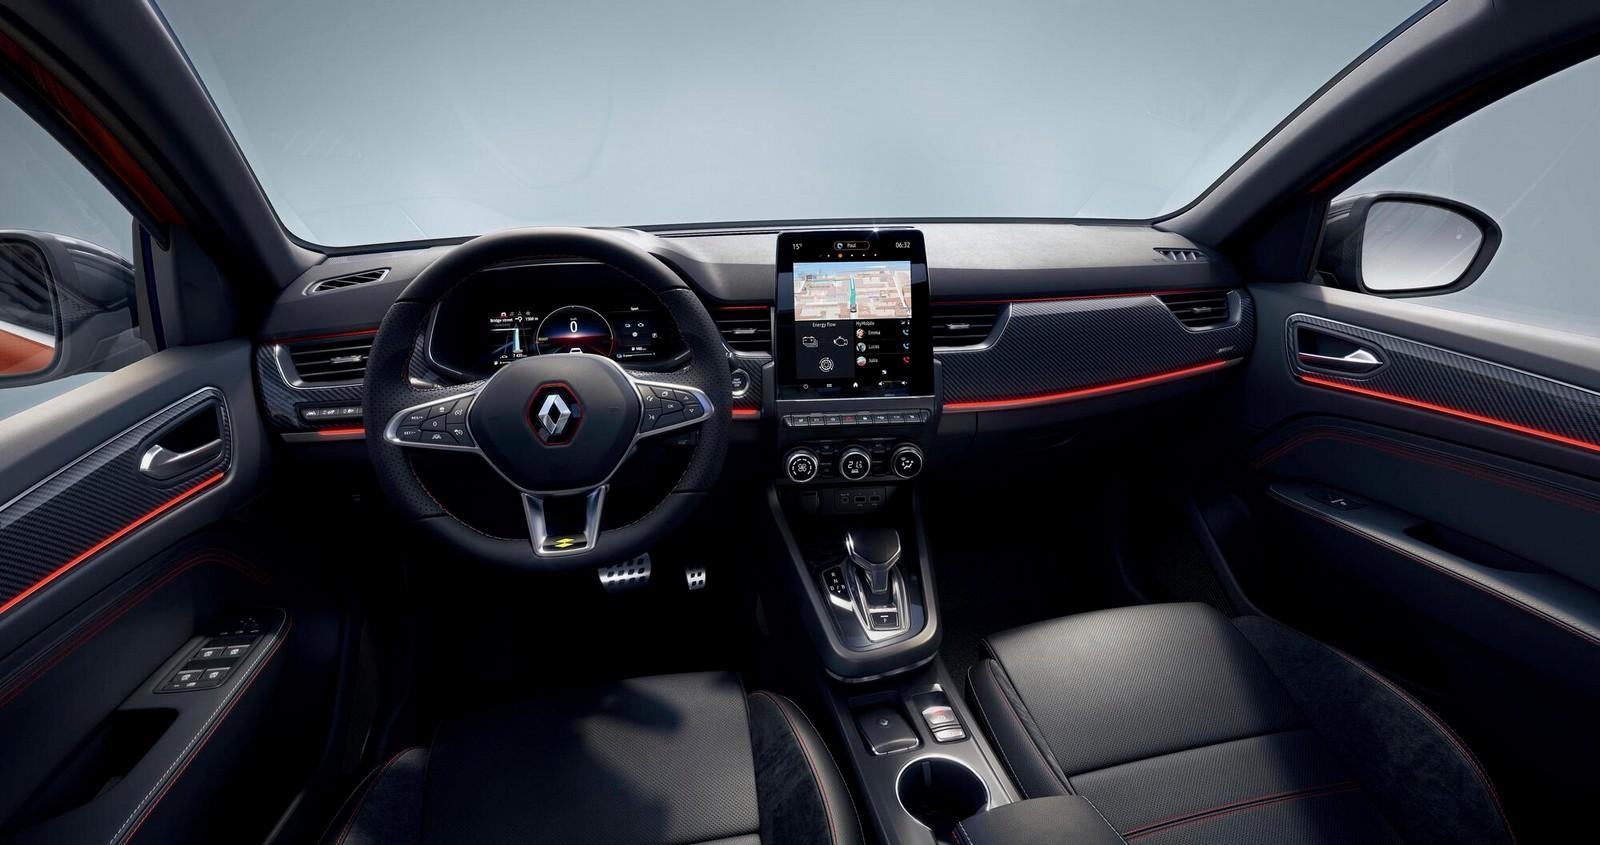 Renault Arkana E Tech (ljl Europe Hev), Renault Megane Conquest E Tech (ljl Adriatic Hev)